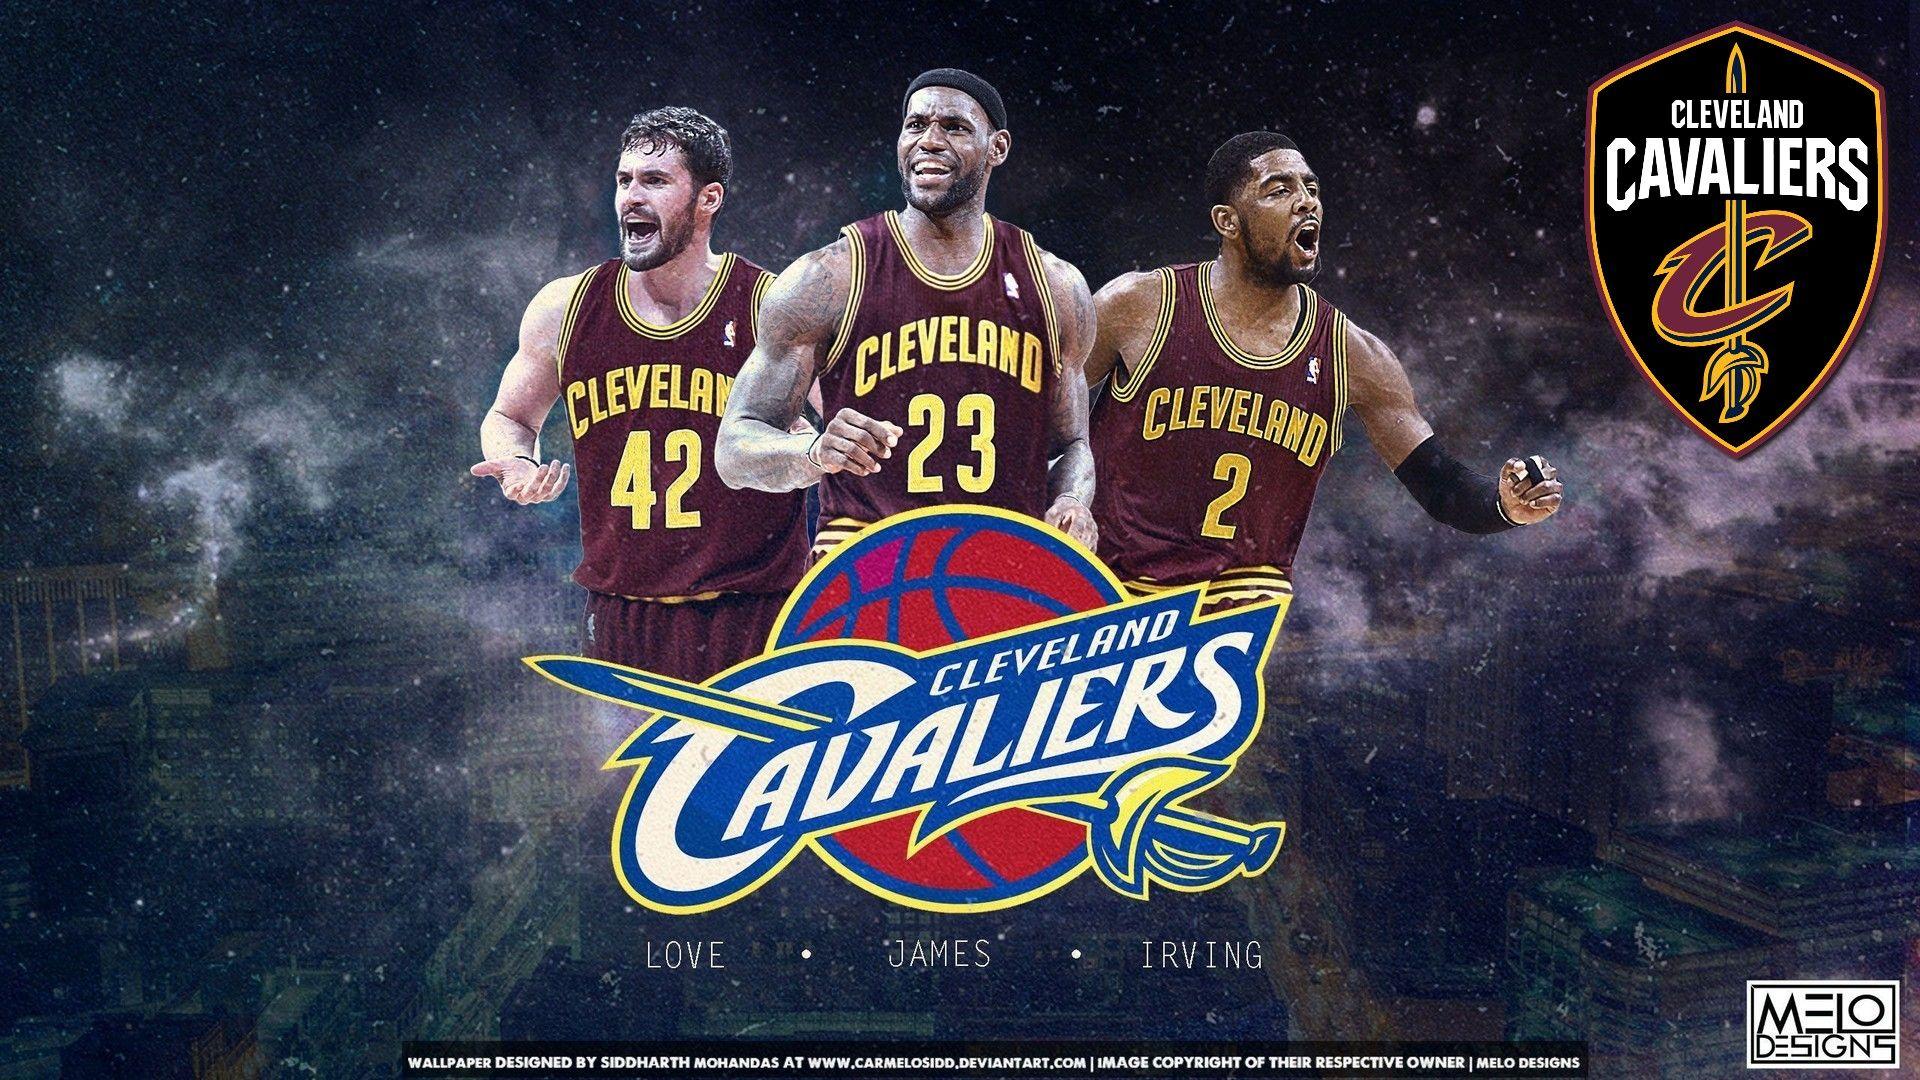 Hd Desktop Wallpaper Big 3 Cleveland Cavaliers Cavaliers Wallpaper Cleveland Wallpapers Lebron James Cleveland